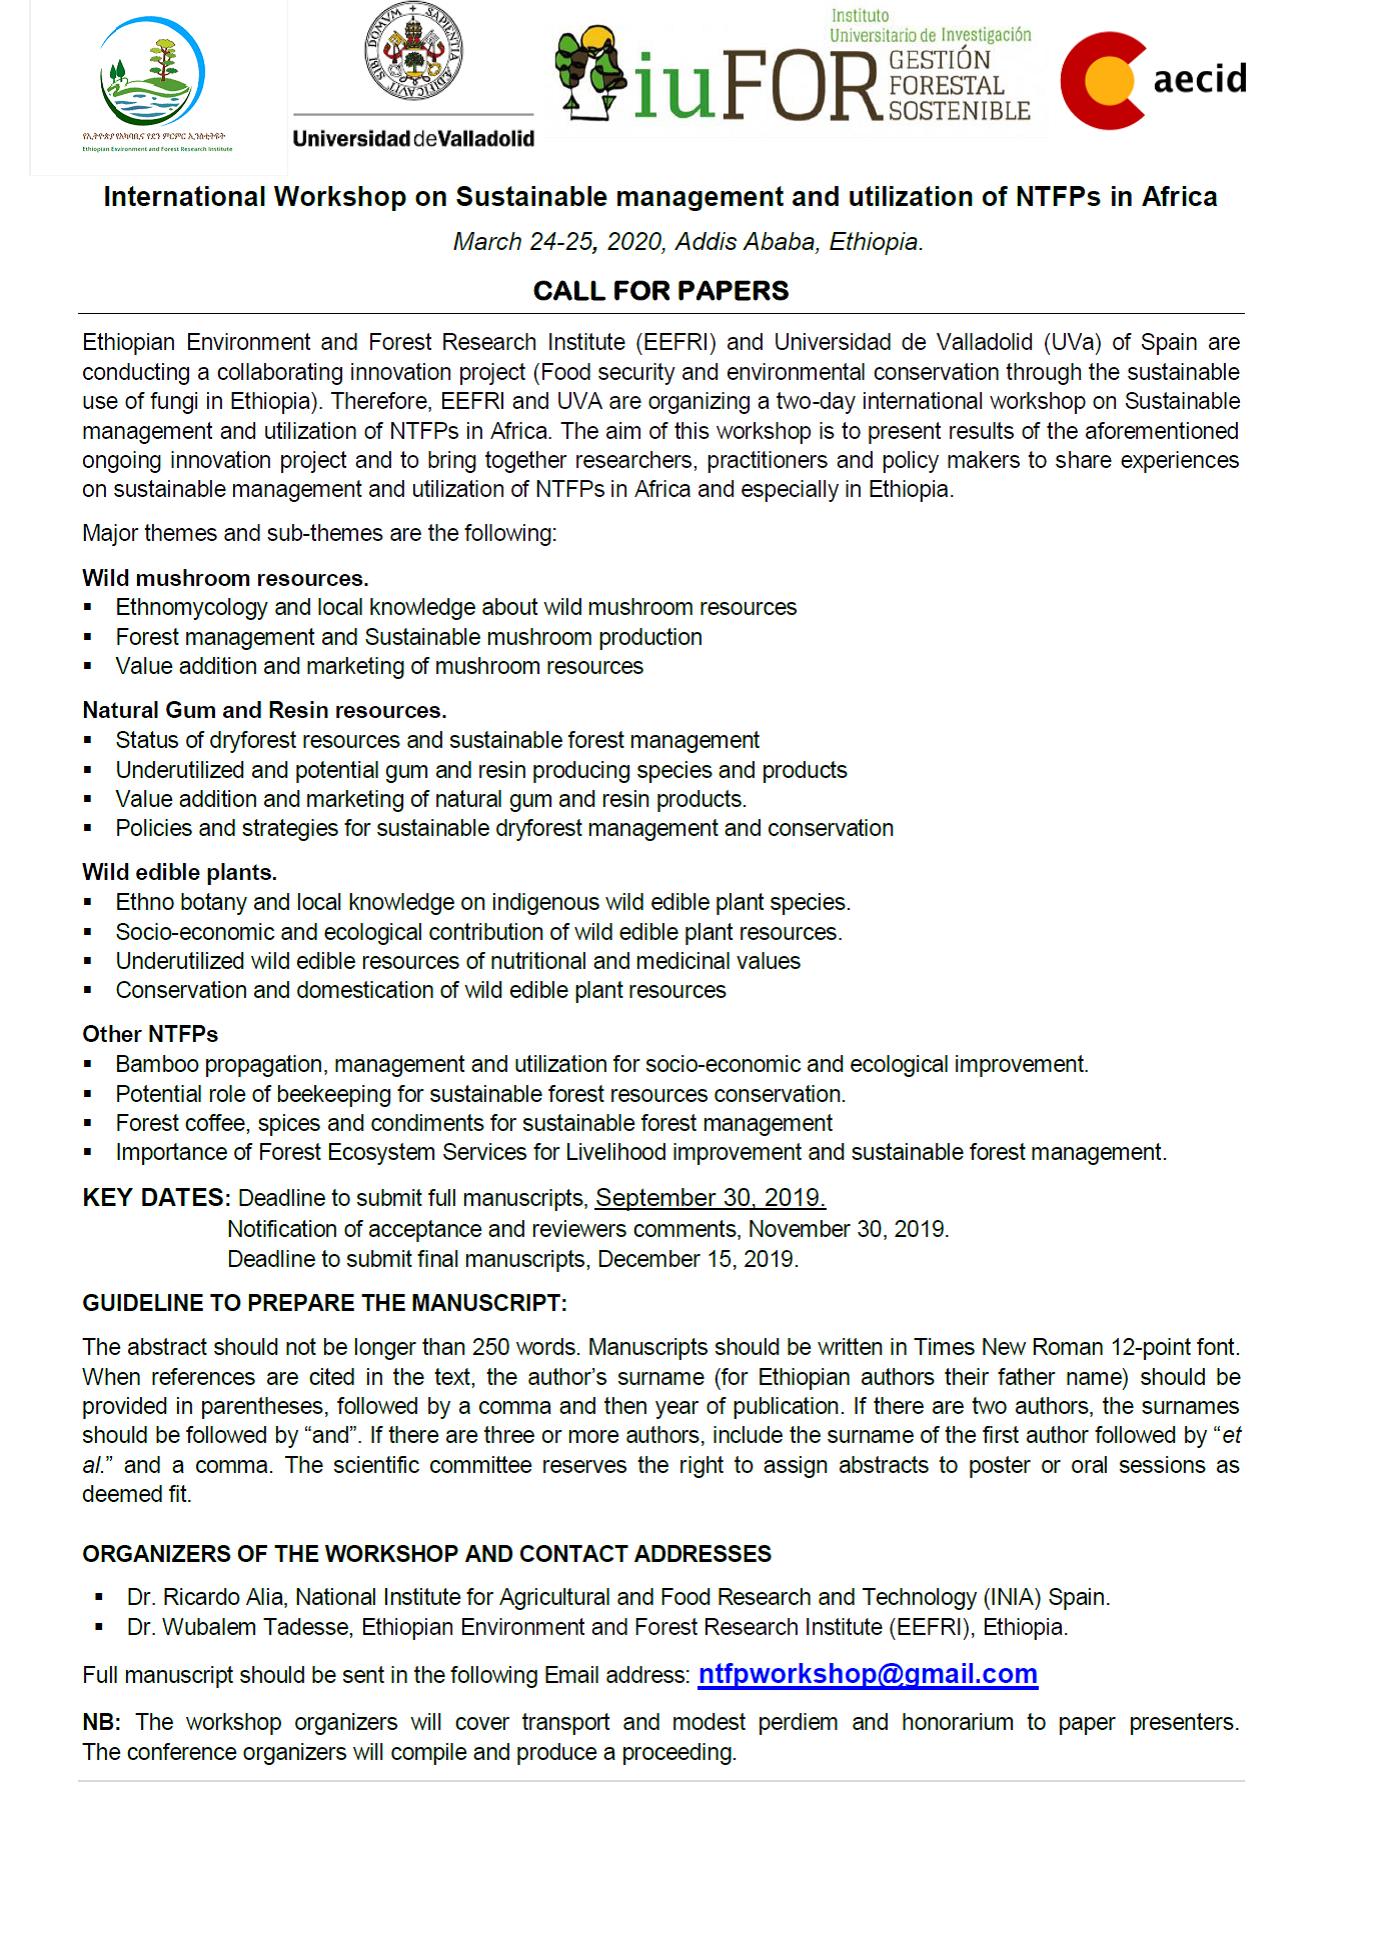 International Workshop on Sustainable Management and